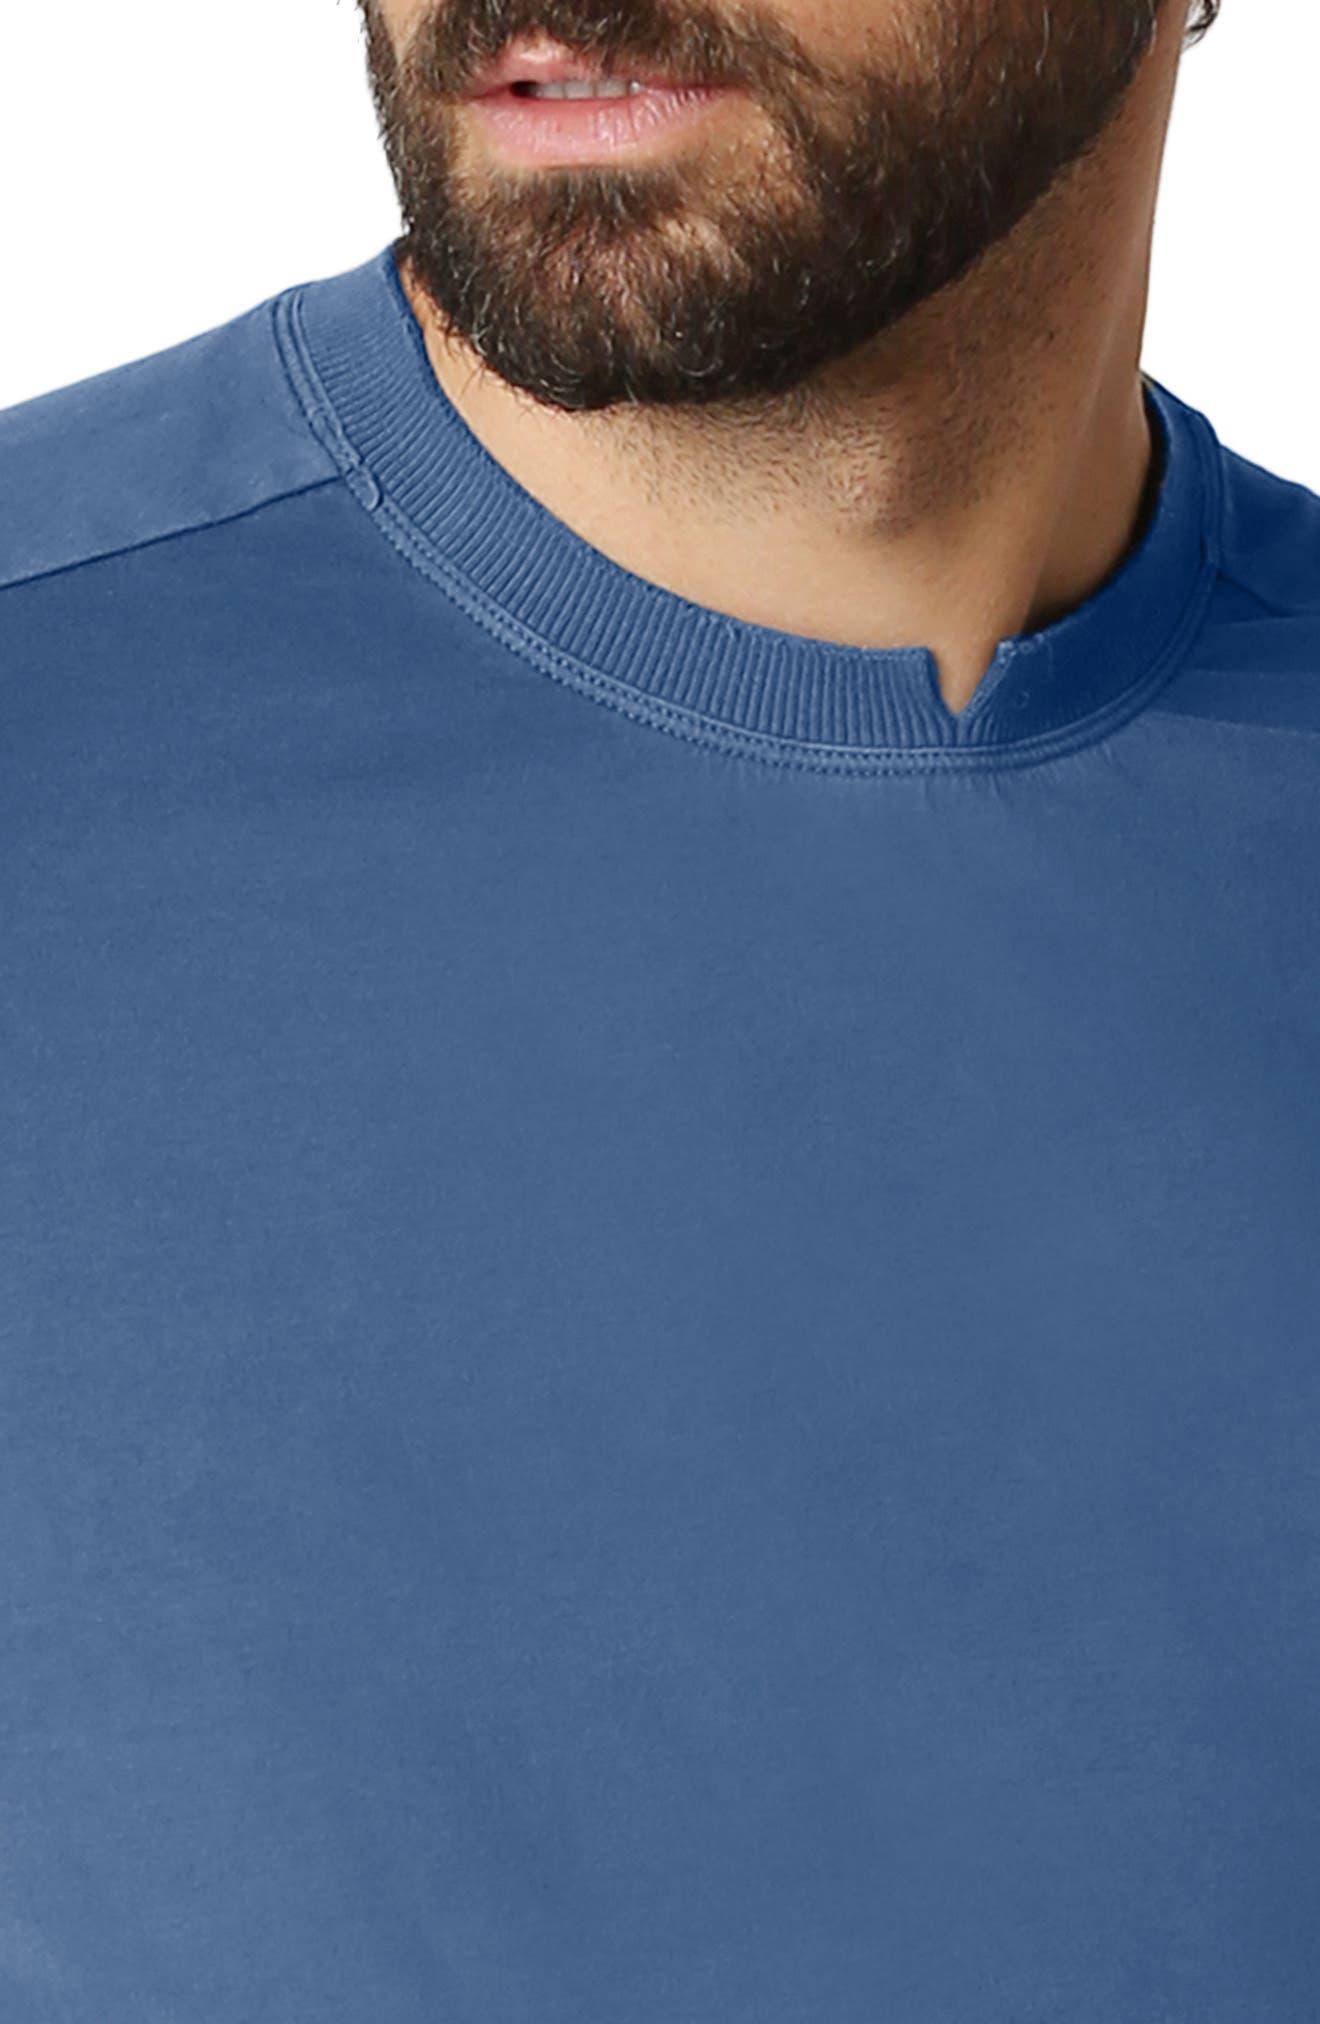 Trim Fit Slub T-Shirt,                             Alternate thumbnail 3, color,                             Denim Blue